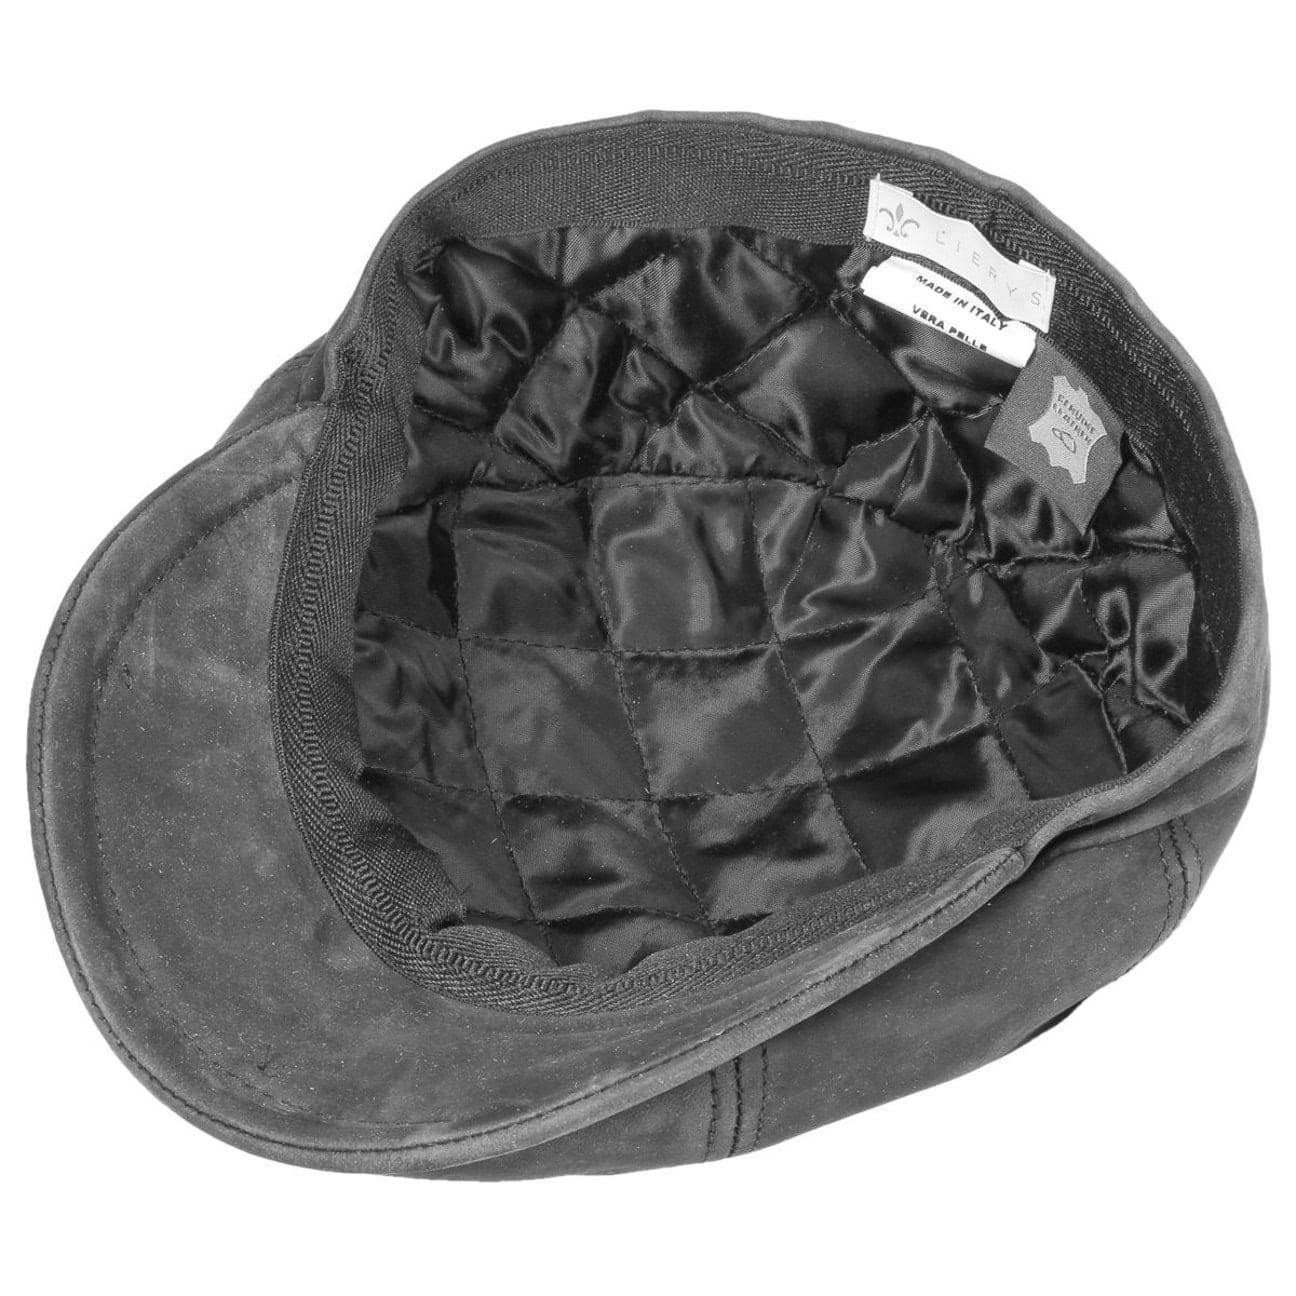 b971308a6b3f21 ... Nappa Wax Leather Flat Cap by Lierys - grey 3 ...